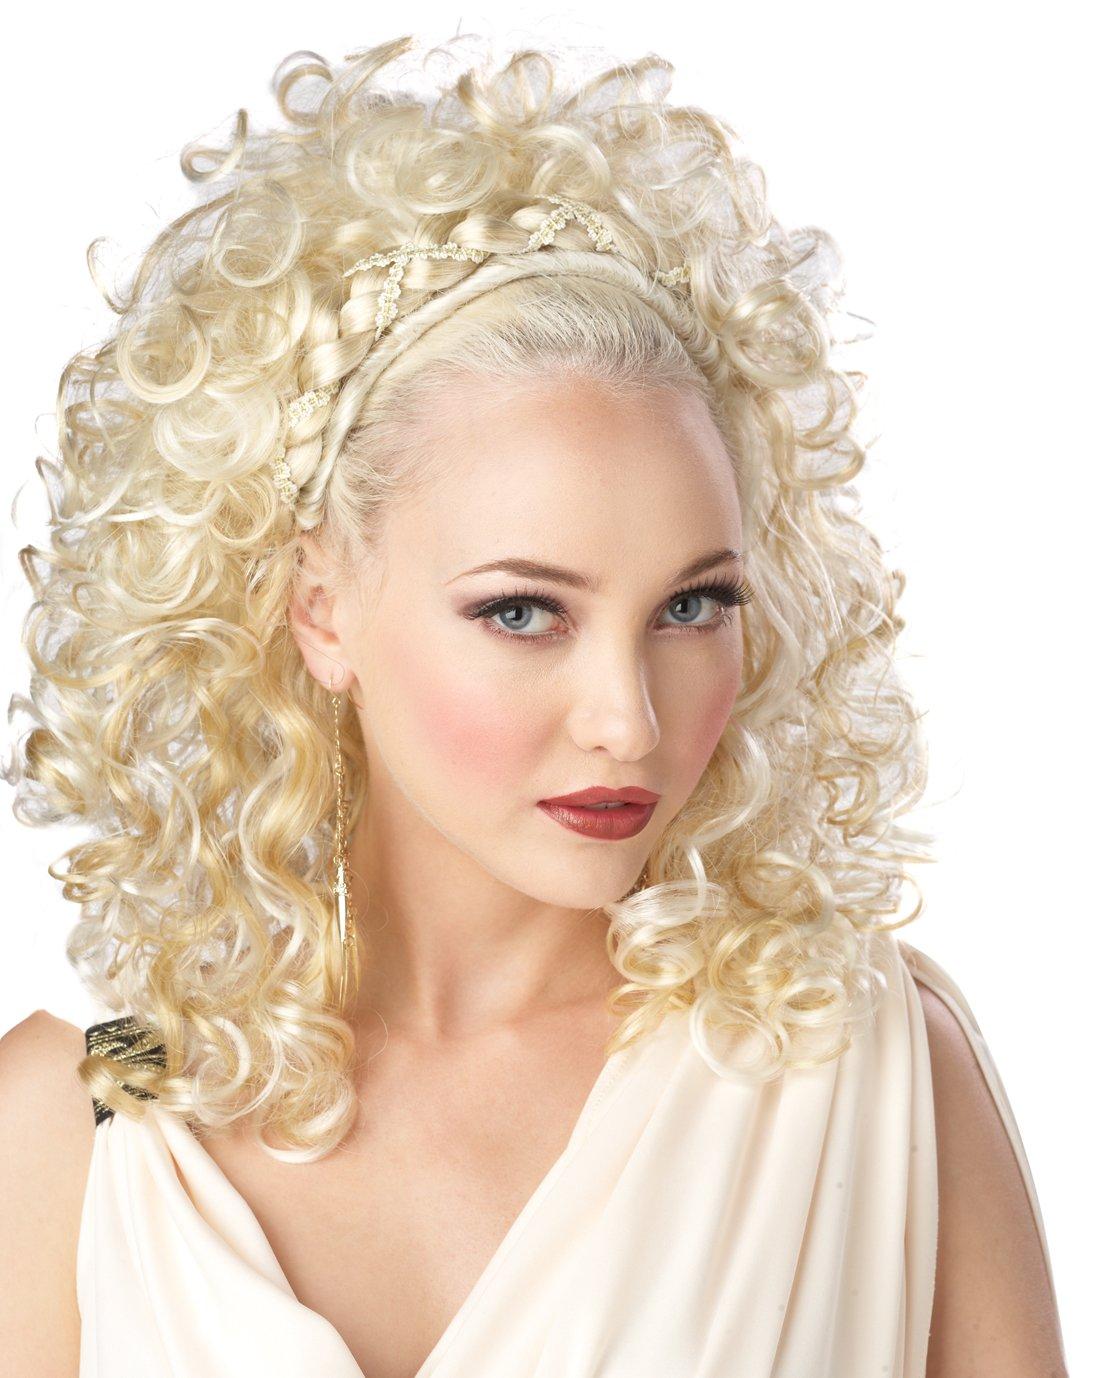 Greek Grecian Goddess Adult Costume Wig #70016